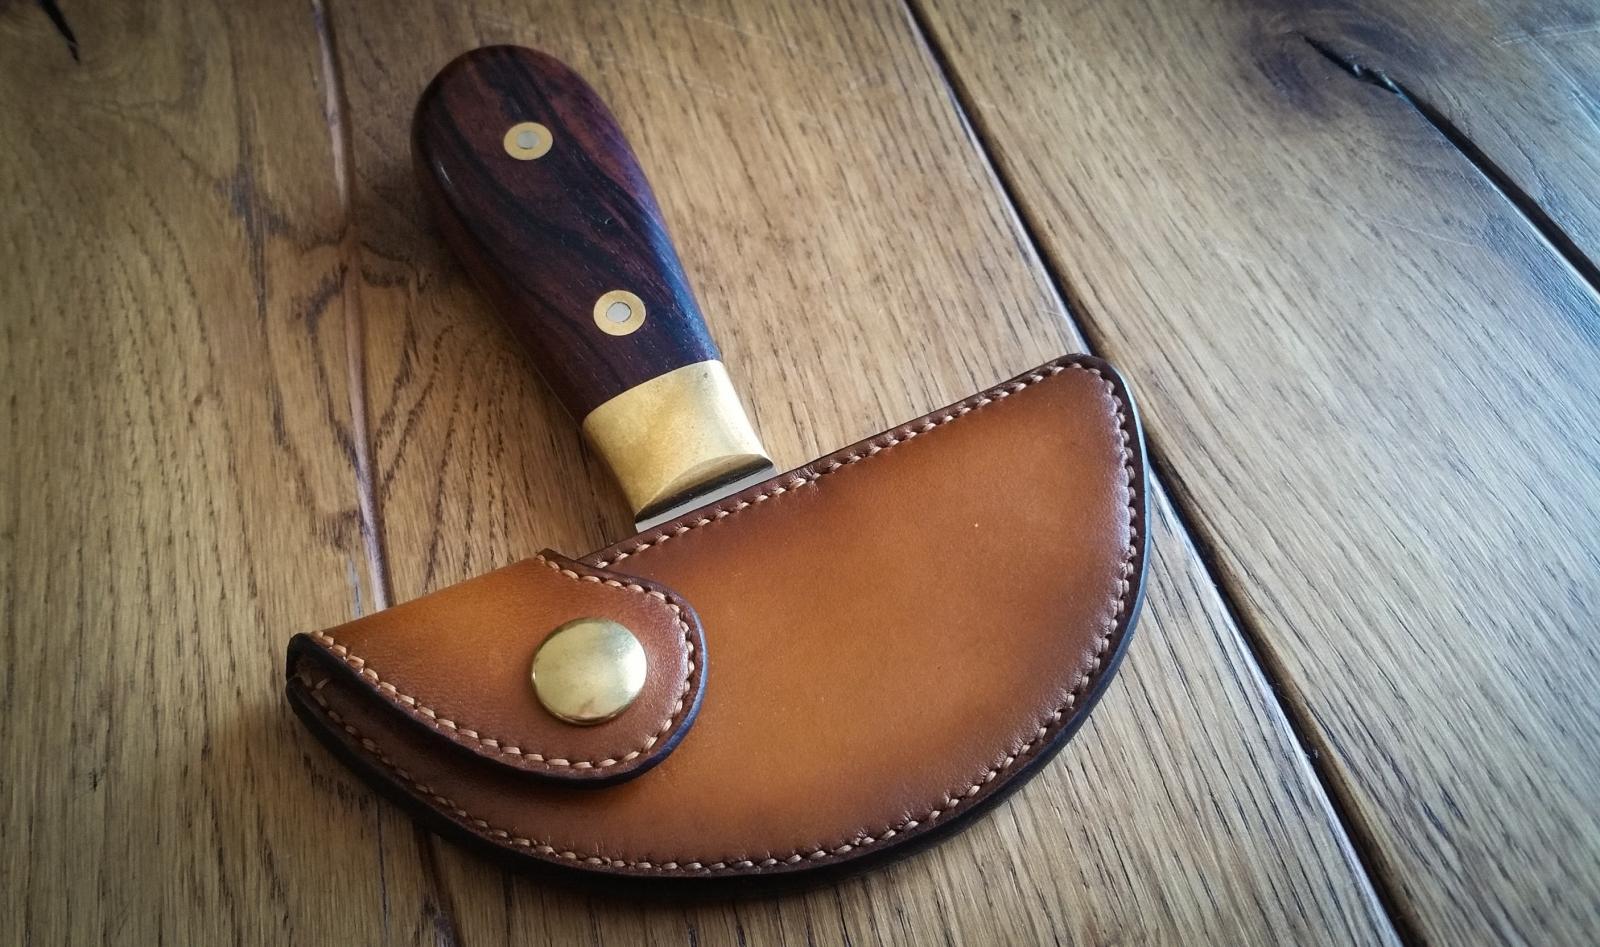 Round Knife Sheath Saddlers Journal Article